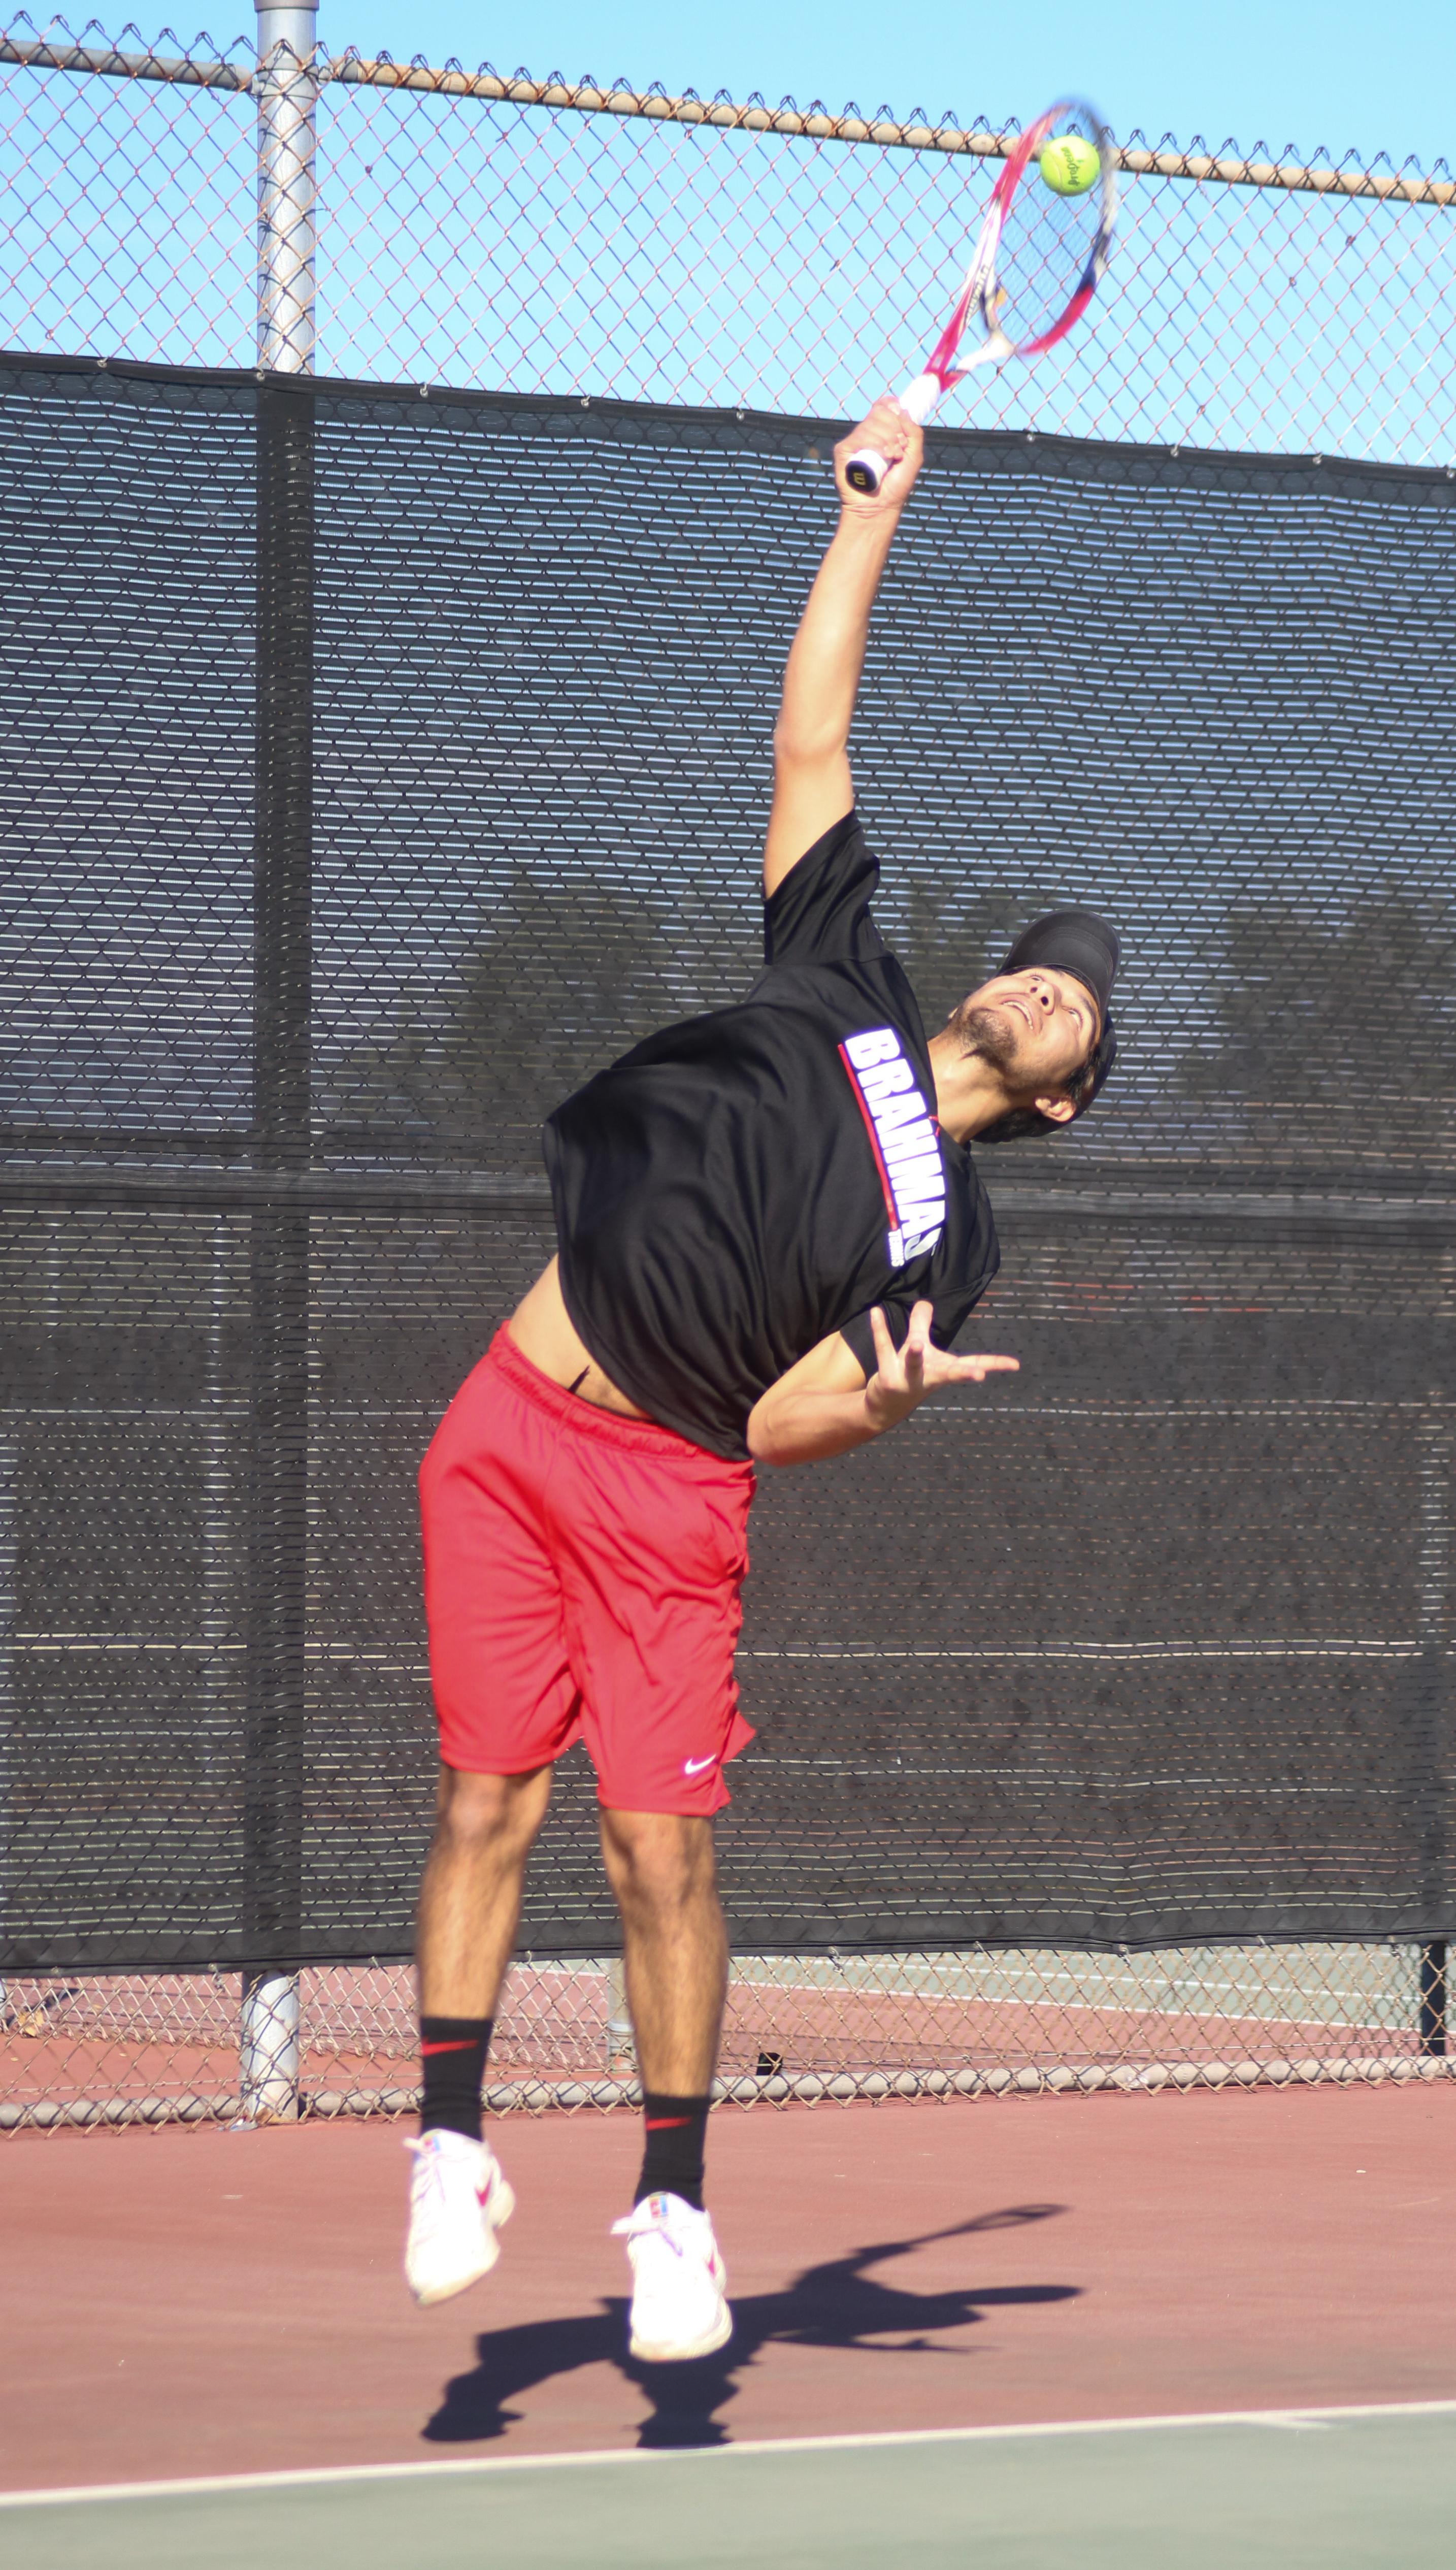 Tennis recruitment mishaps